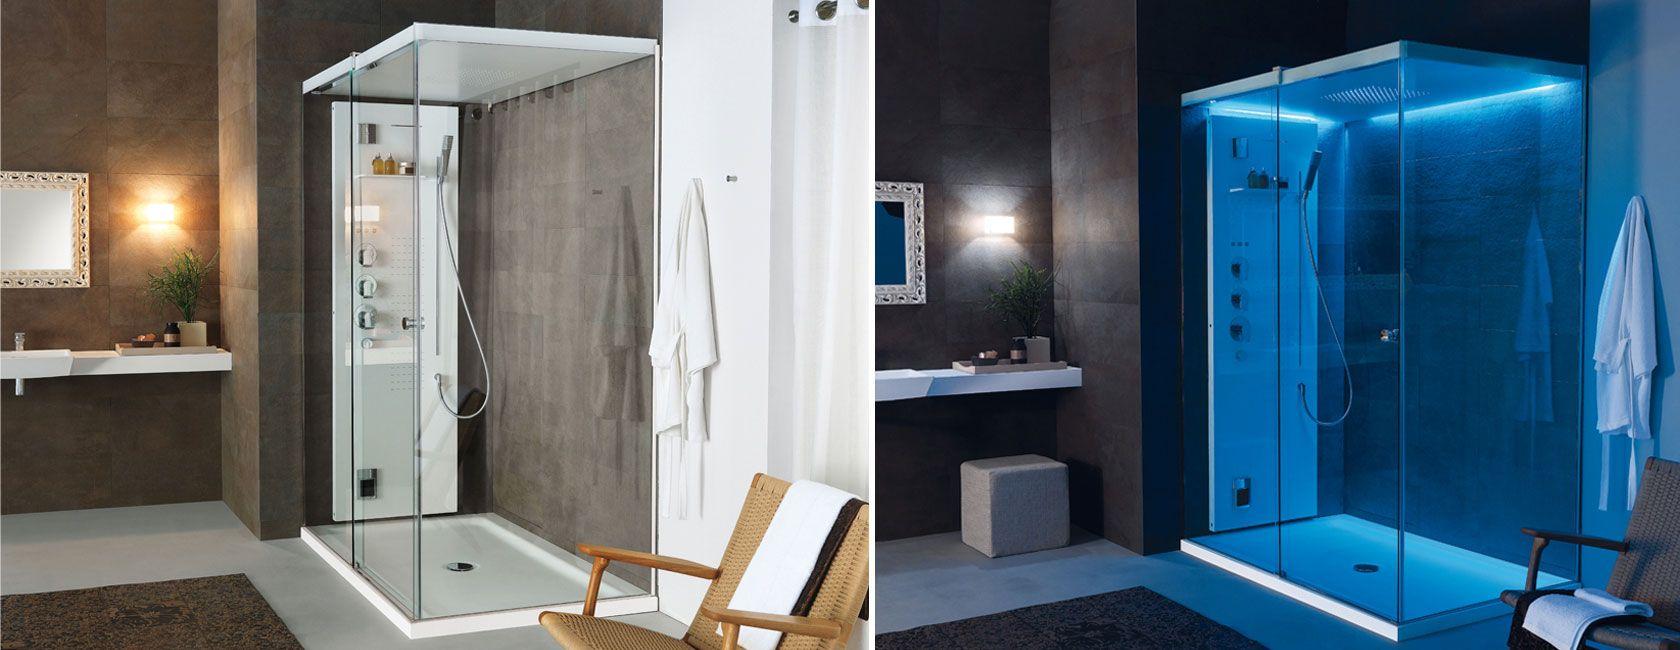 Wohndesign innenraum customisable with centimetreprecision the light shower enclosure